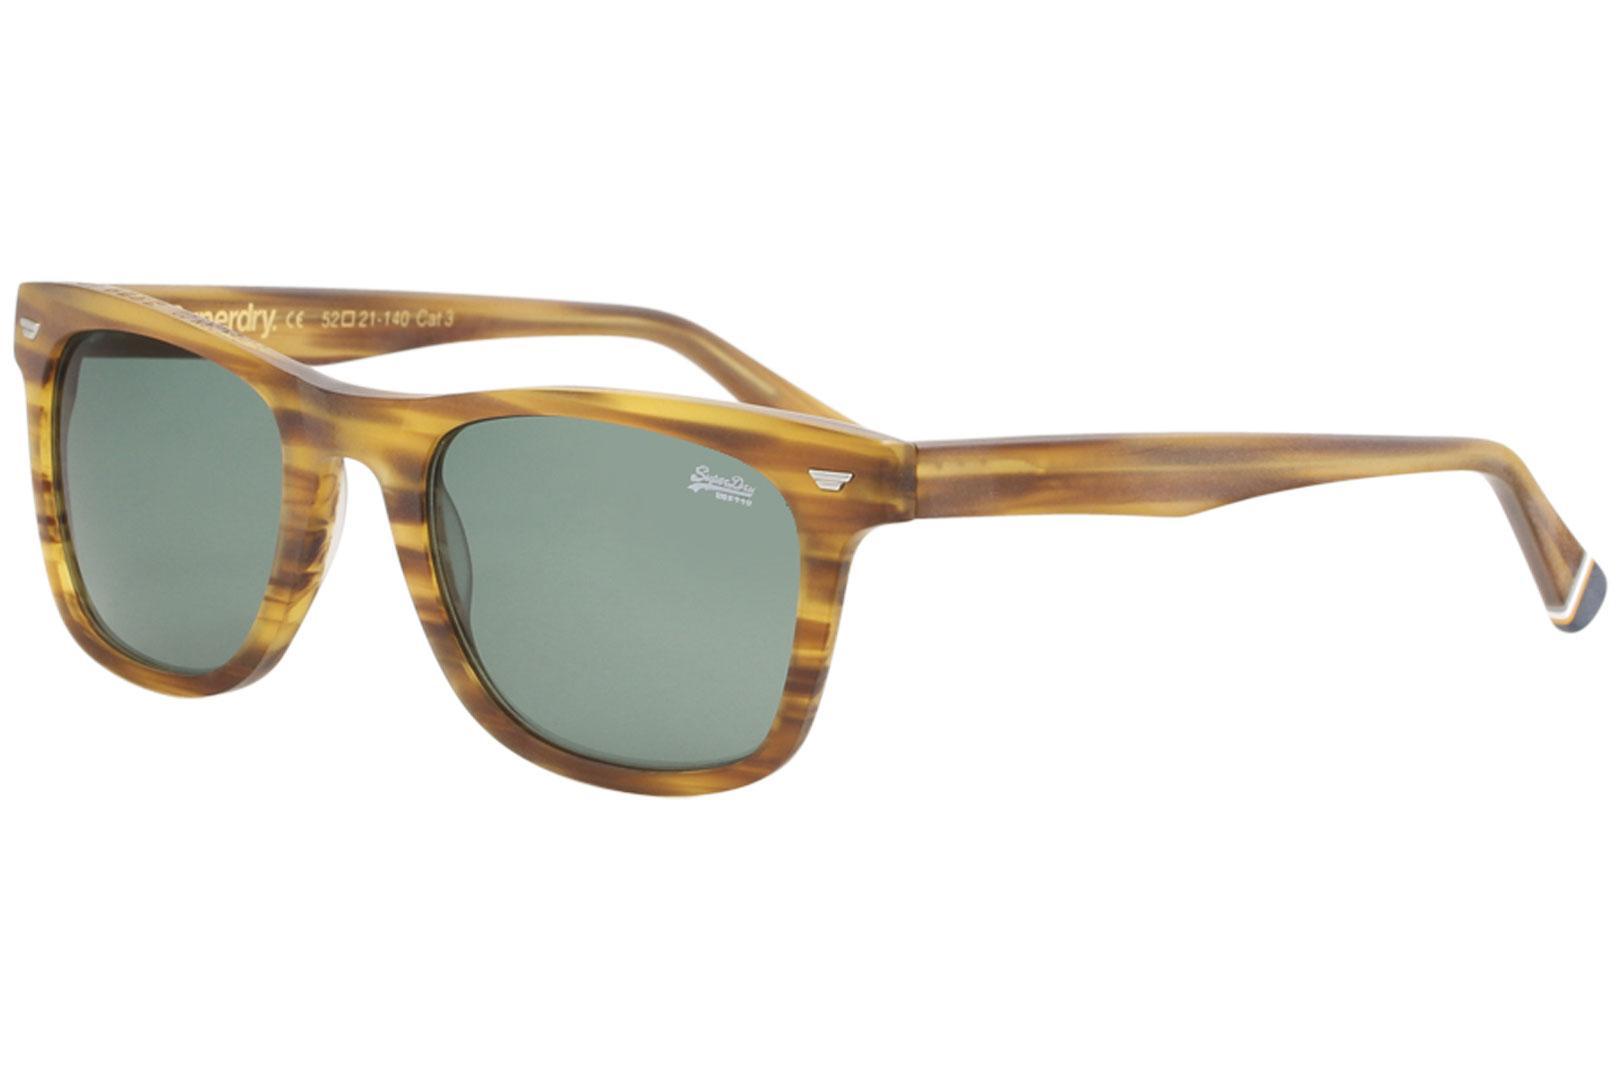 Image of Superdry SDS San Fashion Square Sunglasses - Brown - Lens52 Bridge 21 Temple 140mm